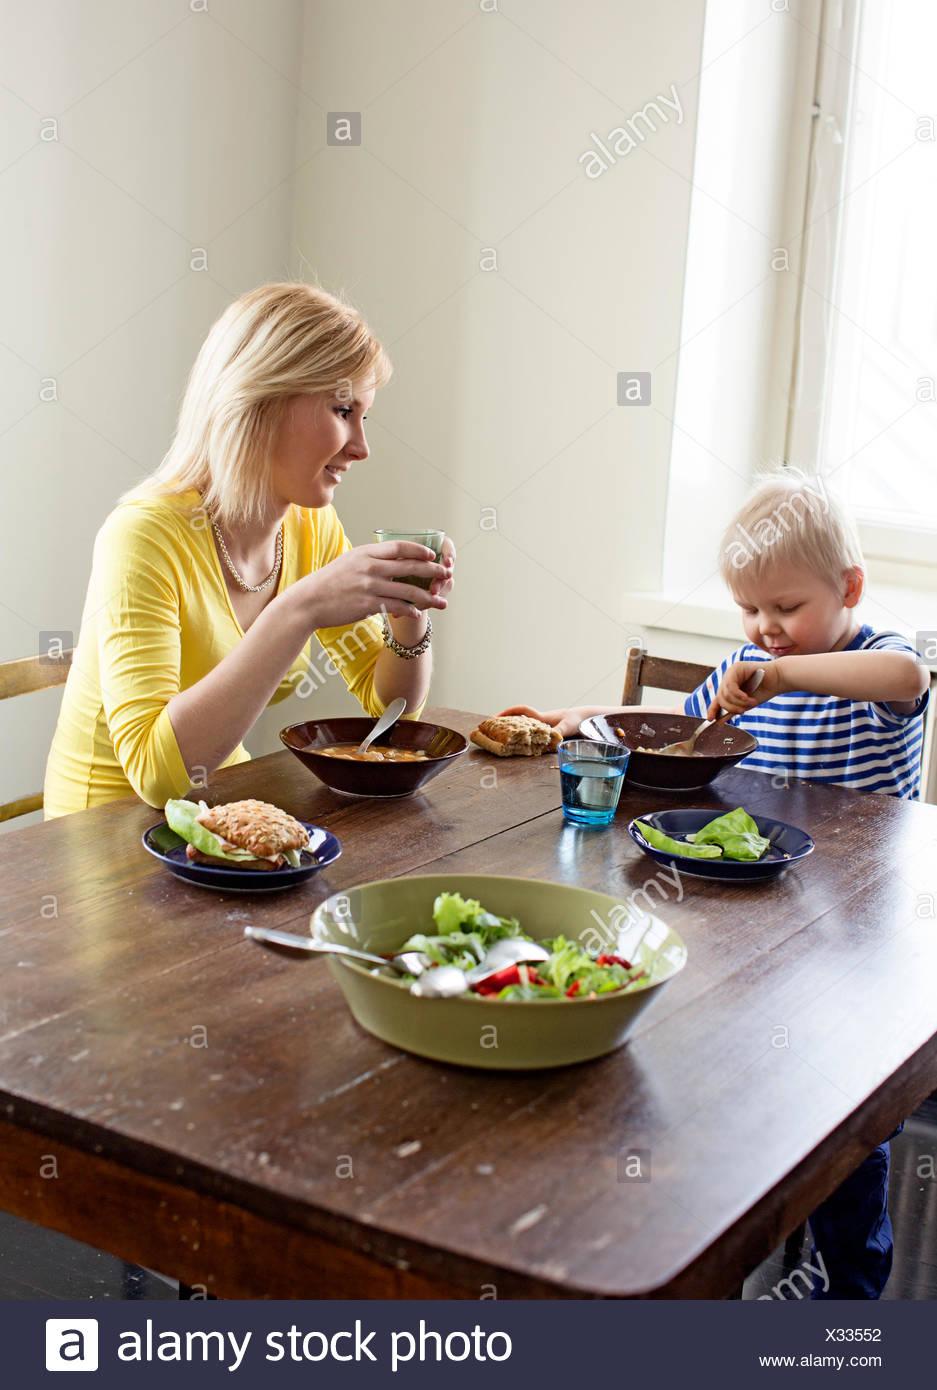 Finland, Helsinki, Kallio, Mother and son having lunch - Stock Image